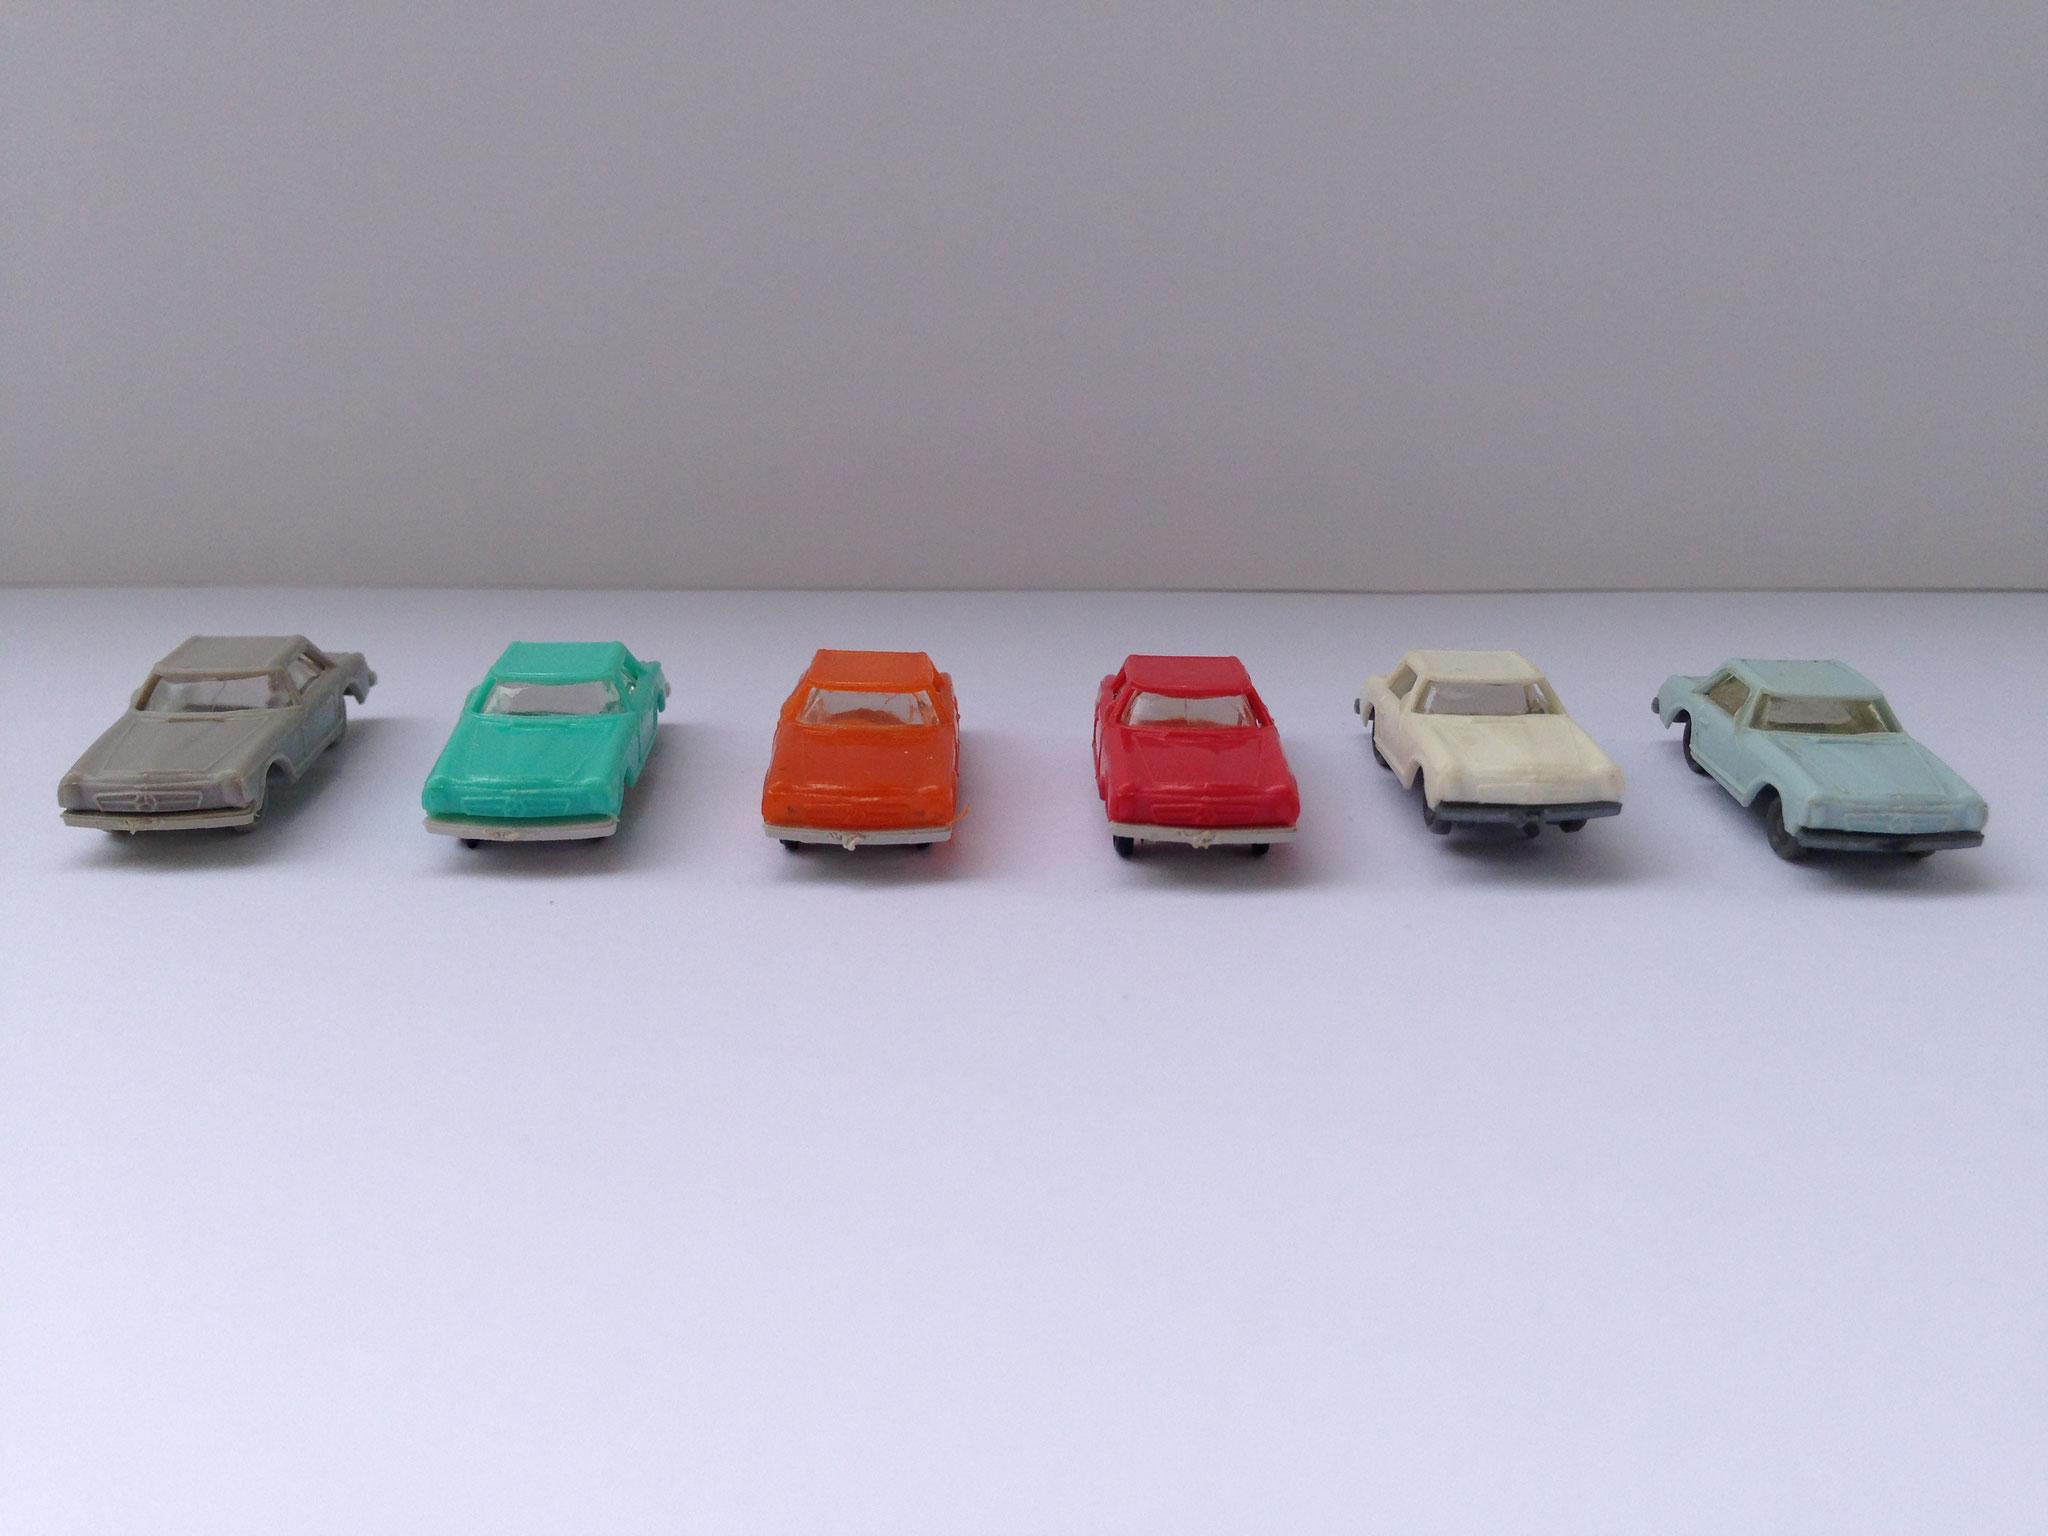 Mercedes 280 SL, Art. Nr. 919 (ab 1970 im Programm)